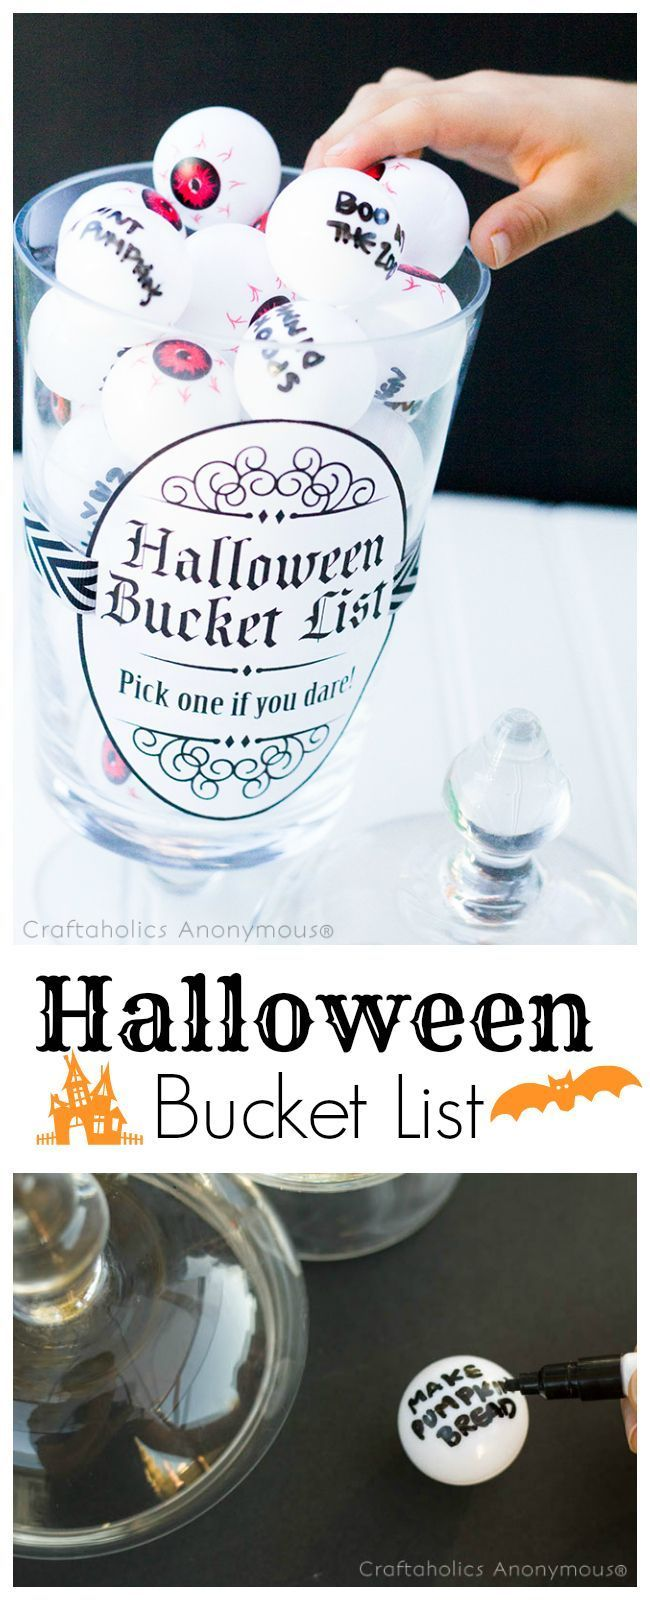 Love this idea! DIY Halloween Bucket list for kids. Great activities for making fun fall memories!